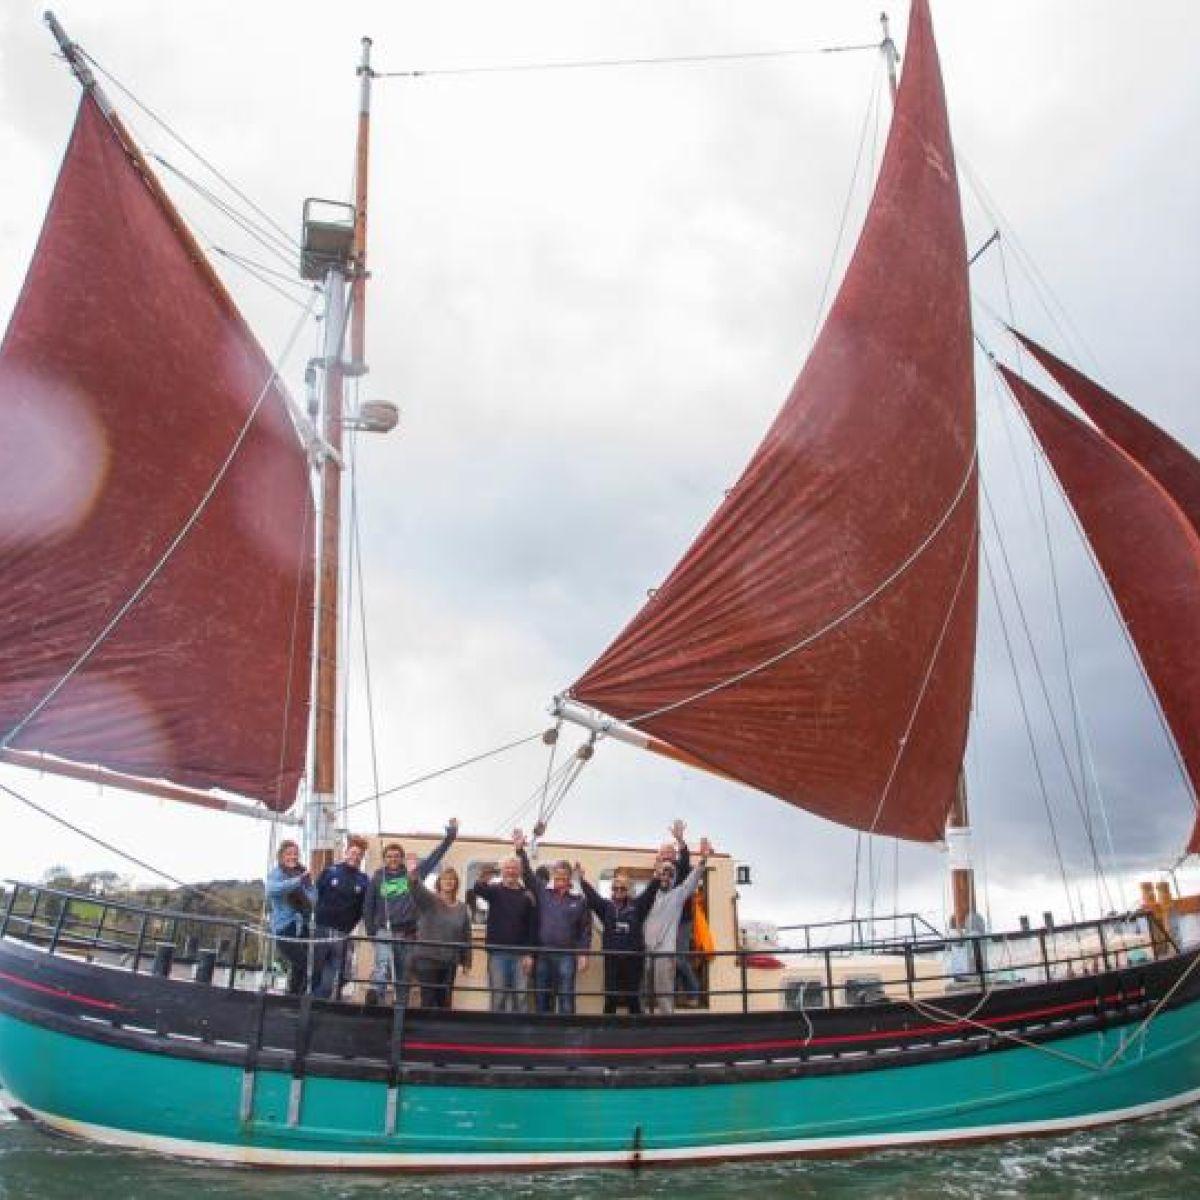 Brian Boru sailing experience to sail under tourist winds